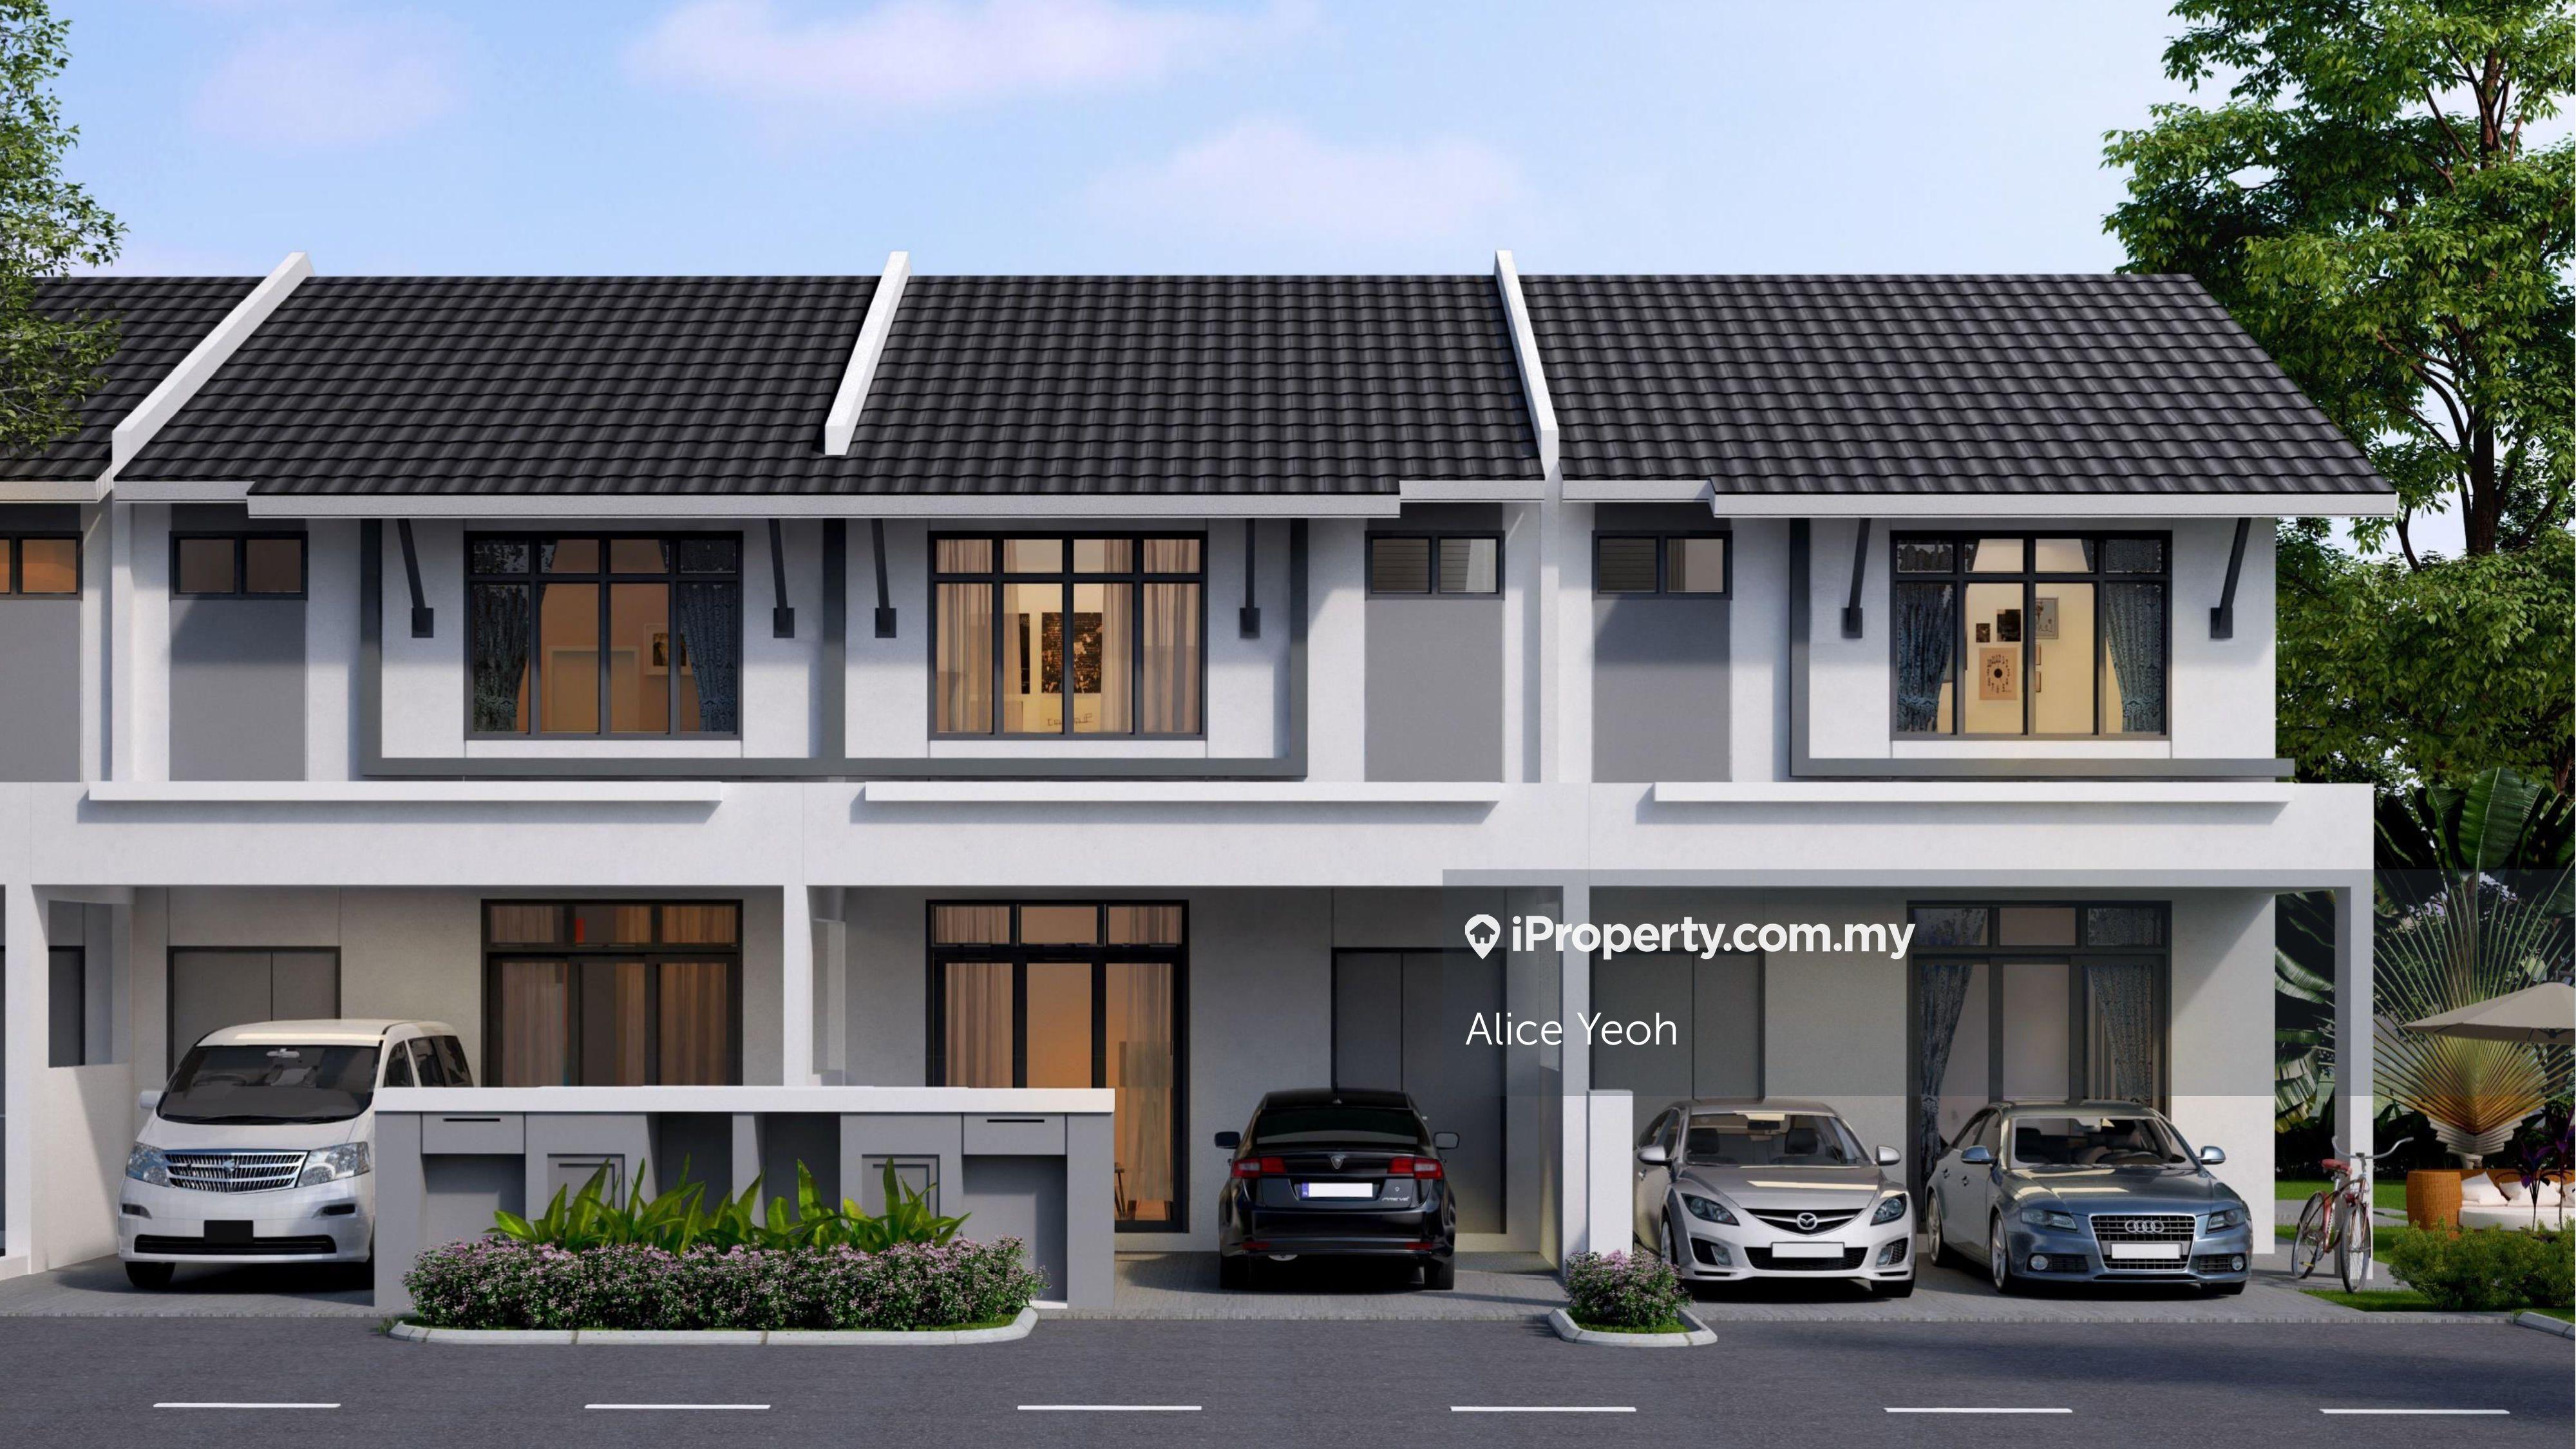 2-Sty Terrace House @ Bandar Mahkota Banting, Banting